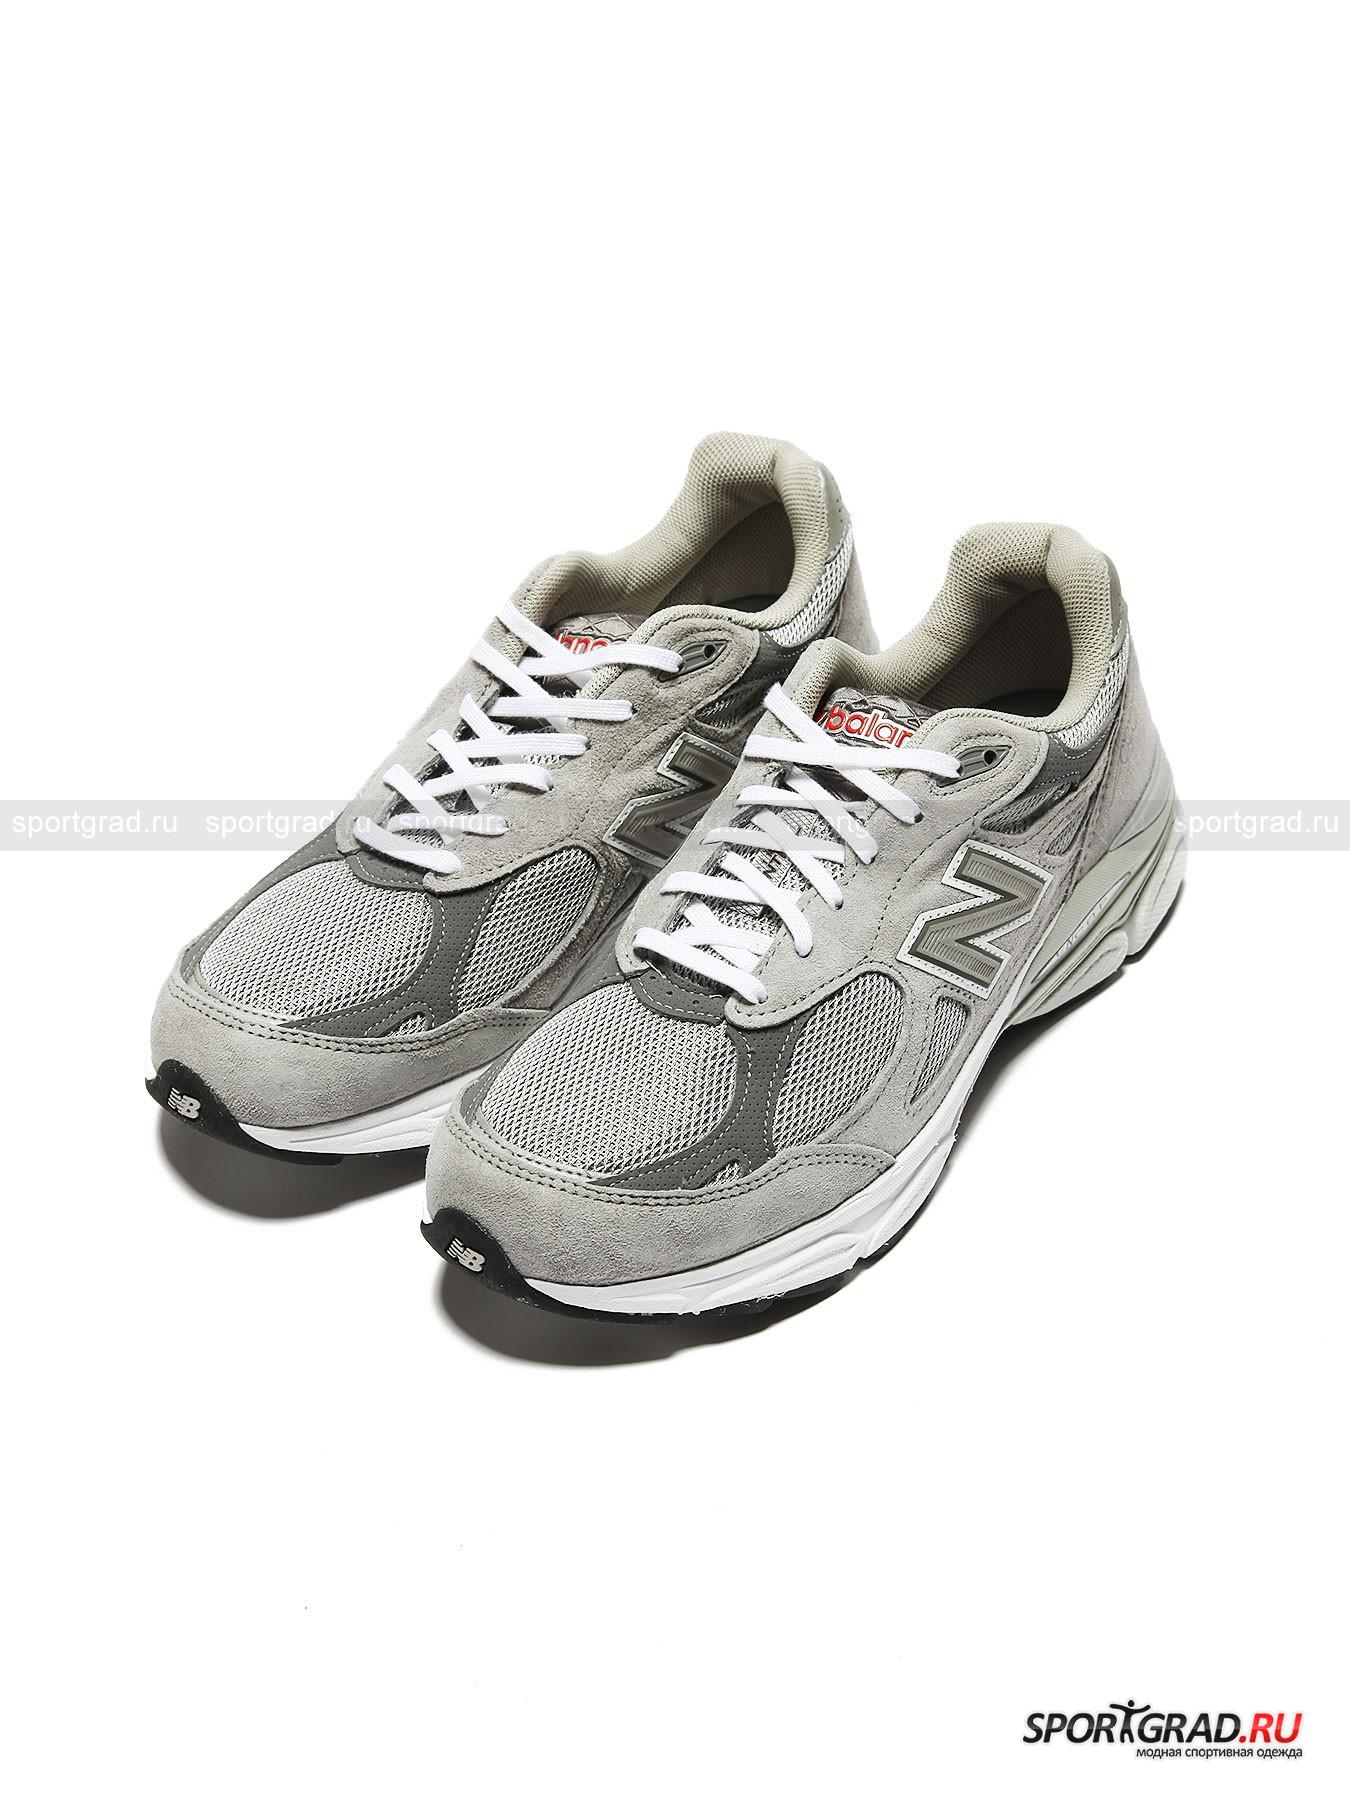 Кроссовки мужские для бега 990 Running Course NEW BALANCE Made in USA